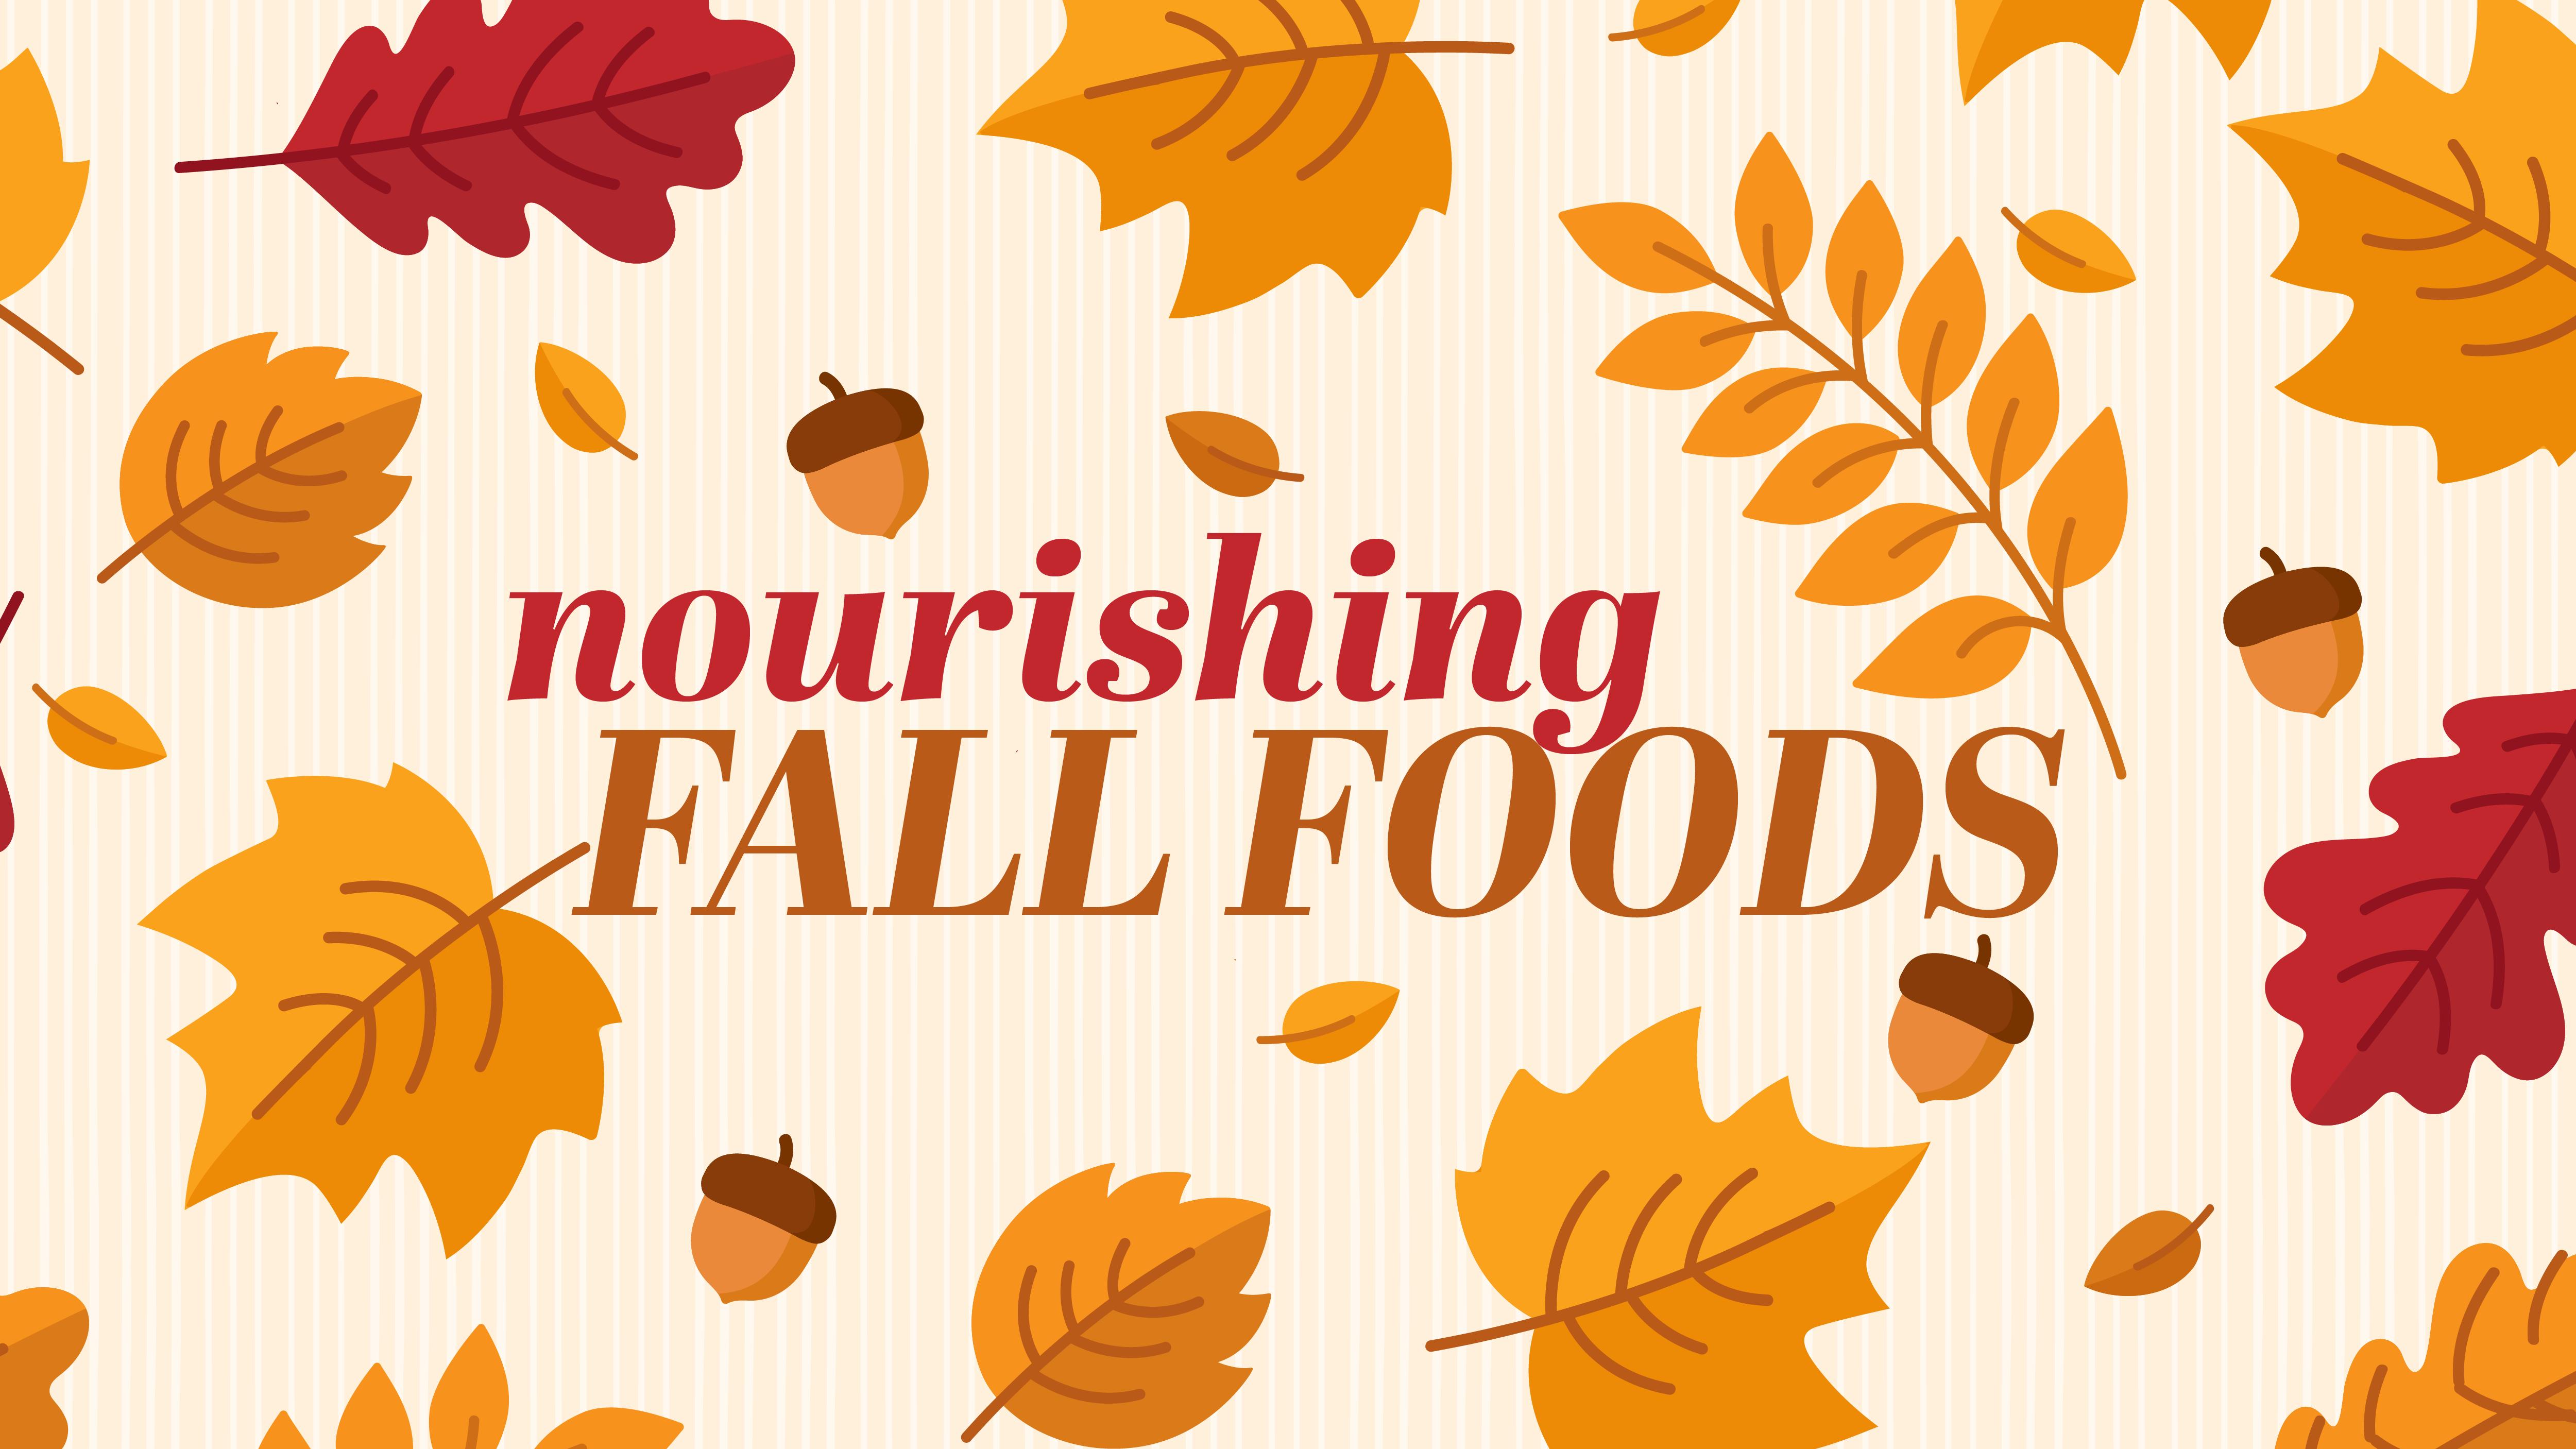 Nourishing Fall Foods